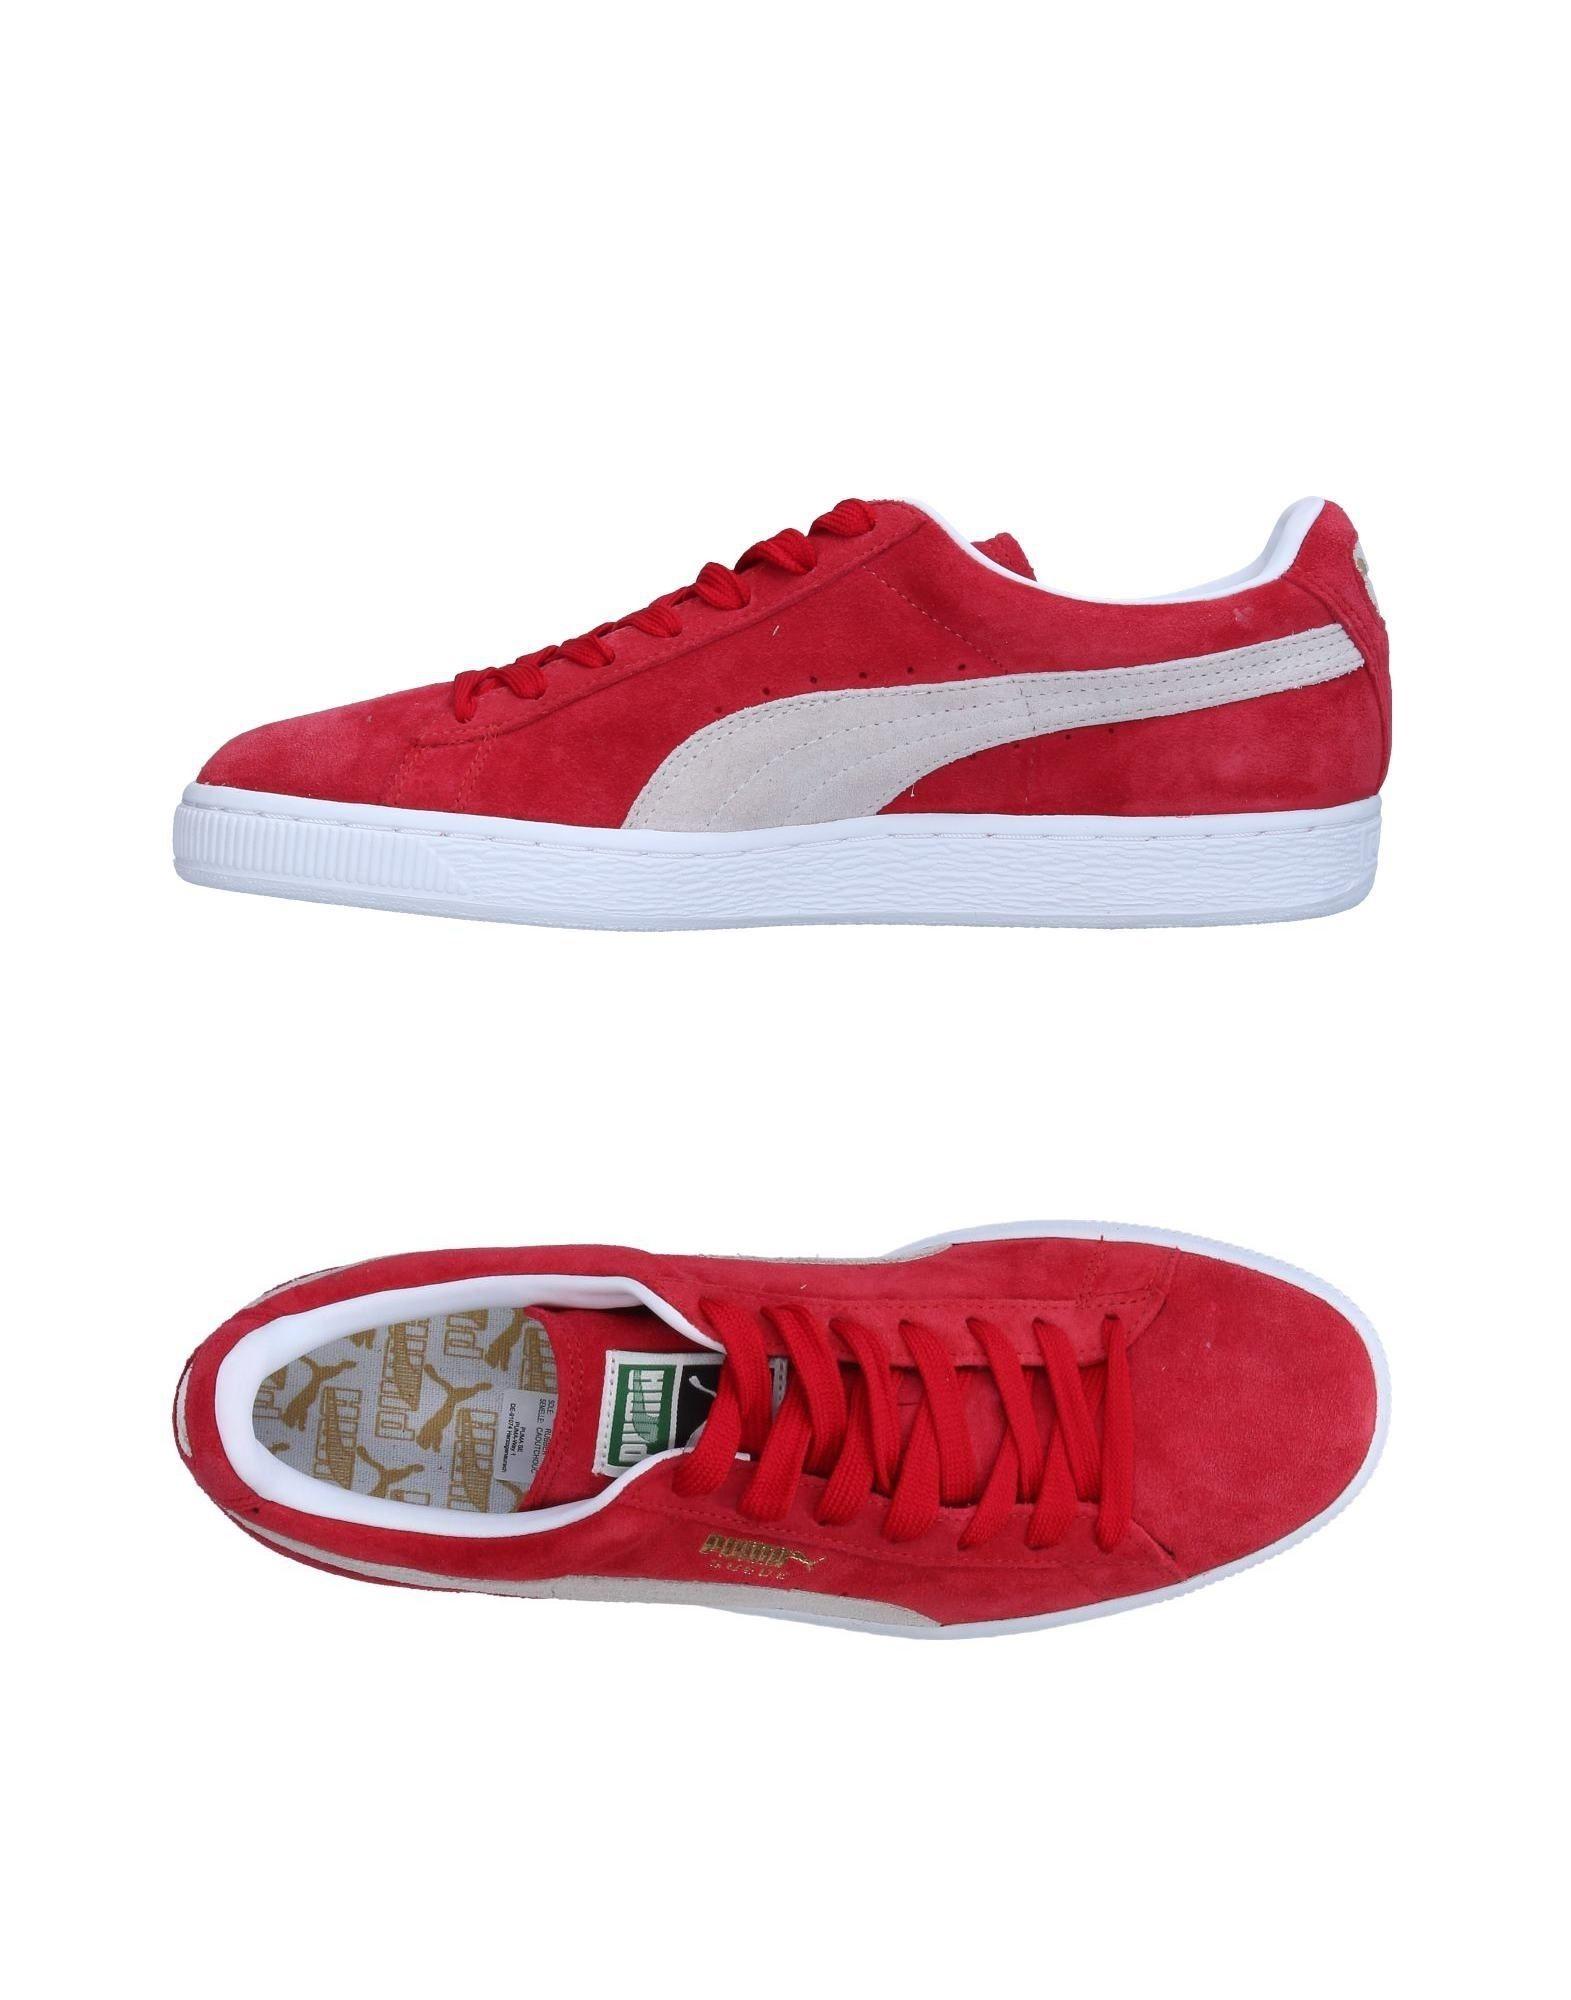 Sneakers Puma Homme - Sneakers Puma sur